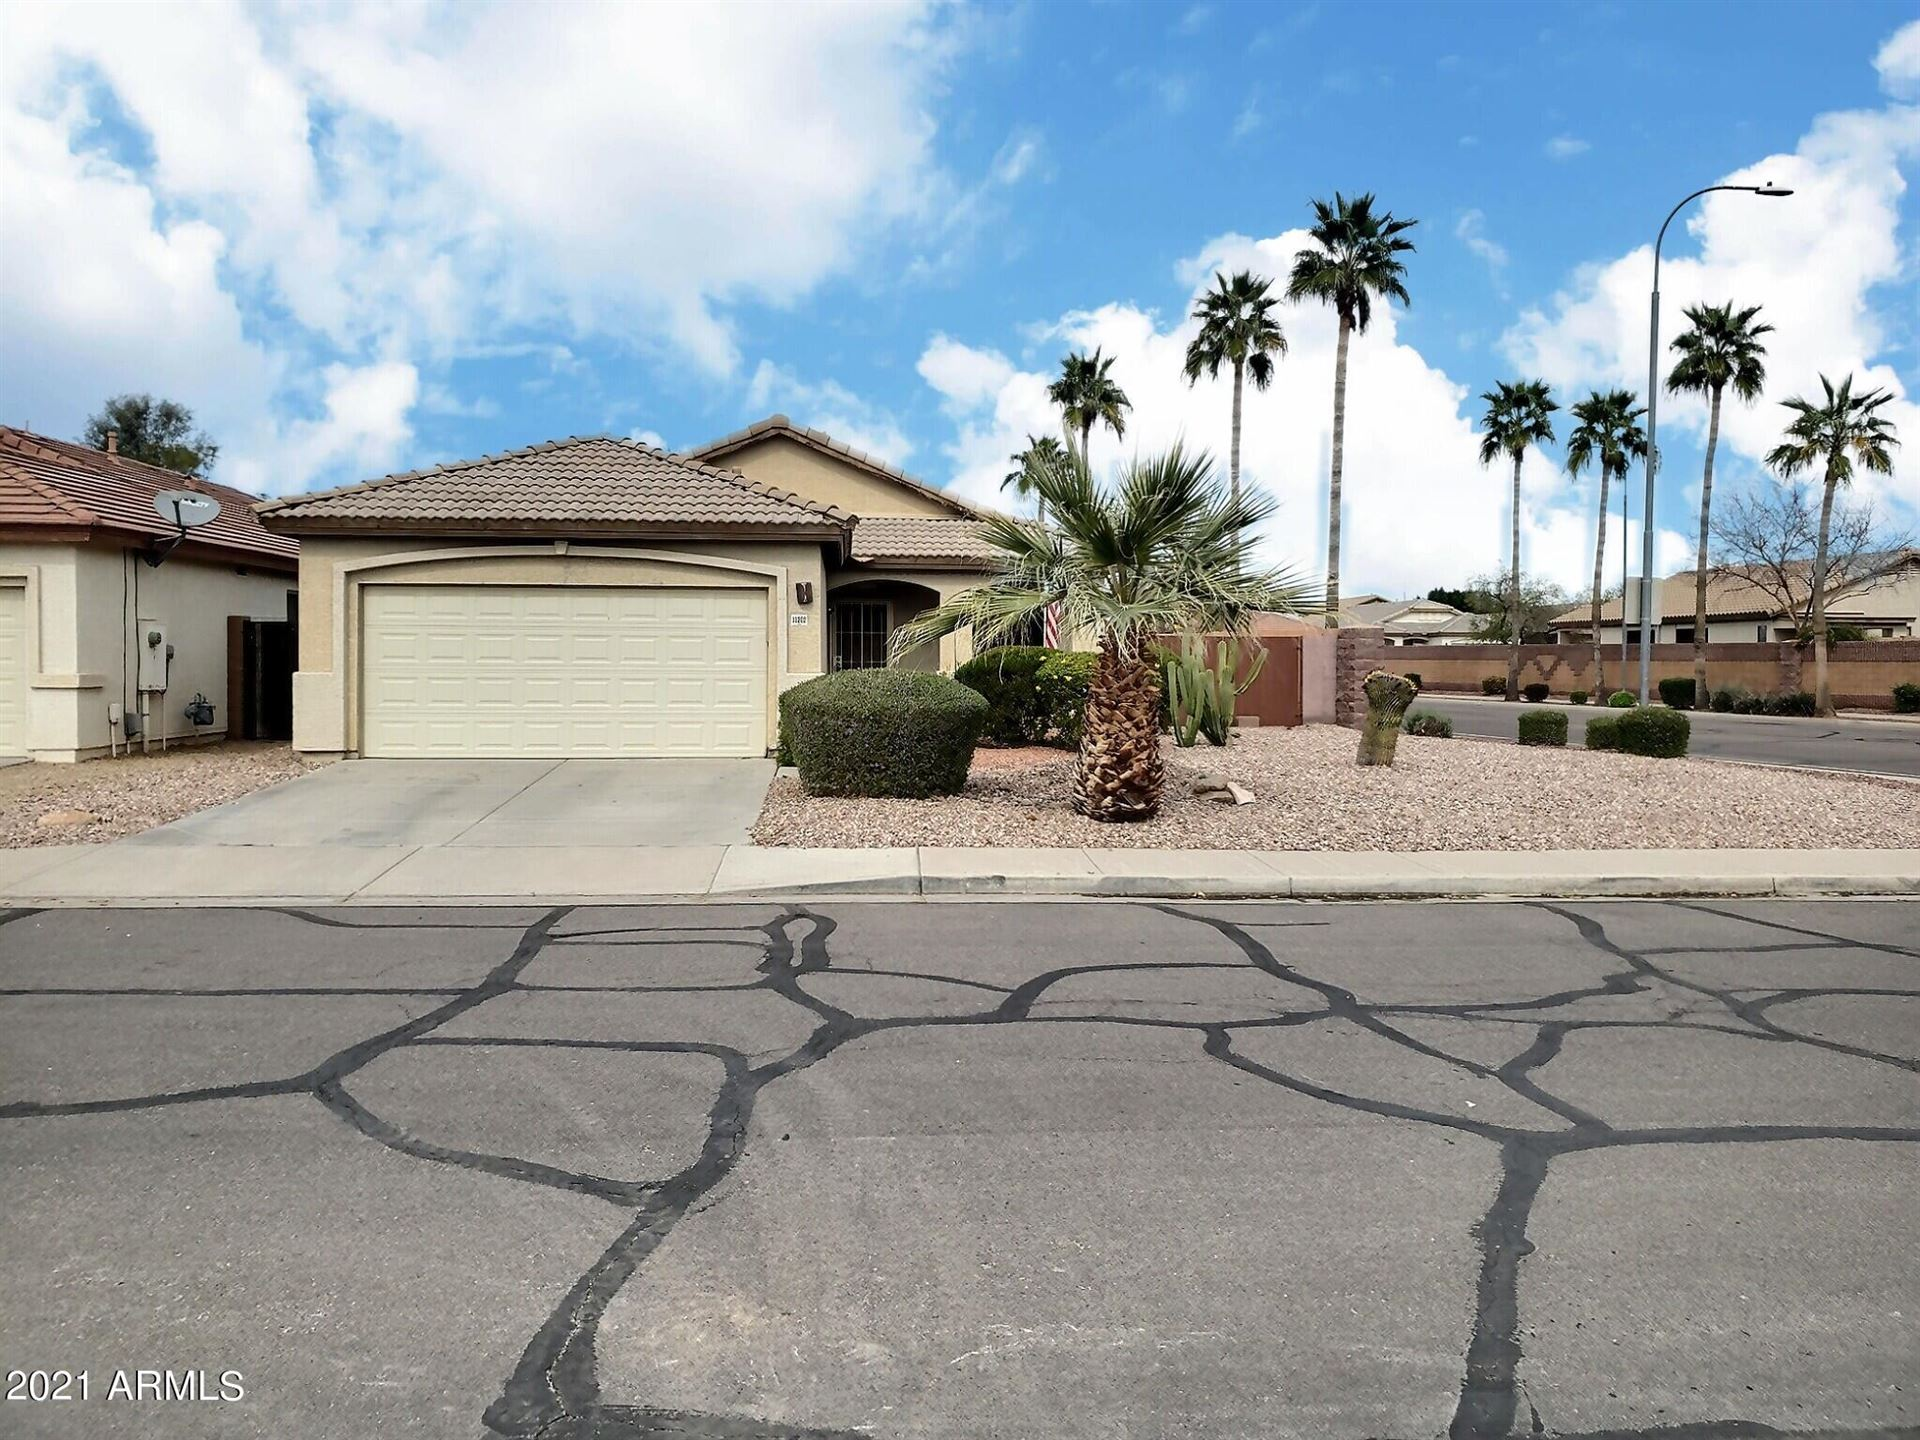 Photo of 11202 W Almeria Road, Avondale, AZ 85392 (MLS # 6199386)